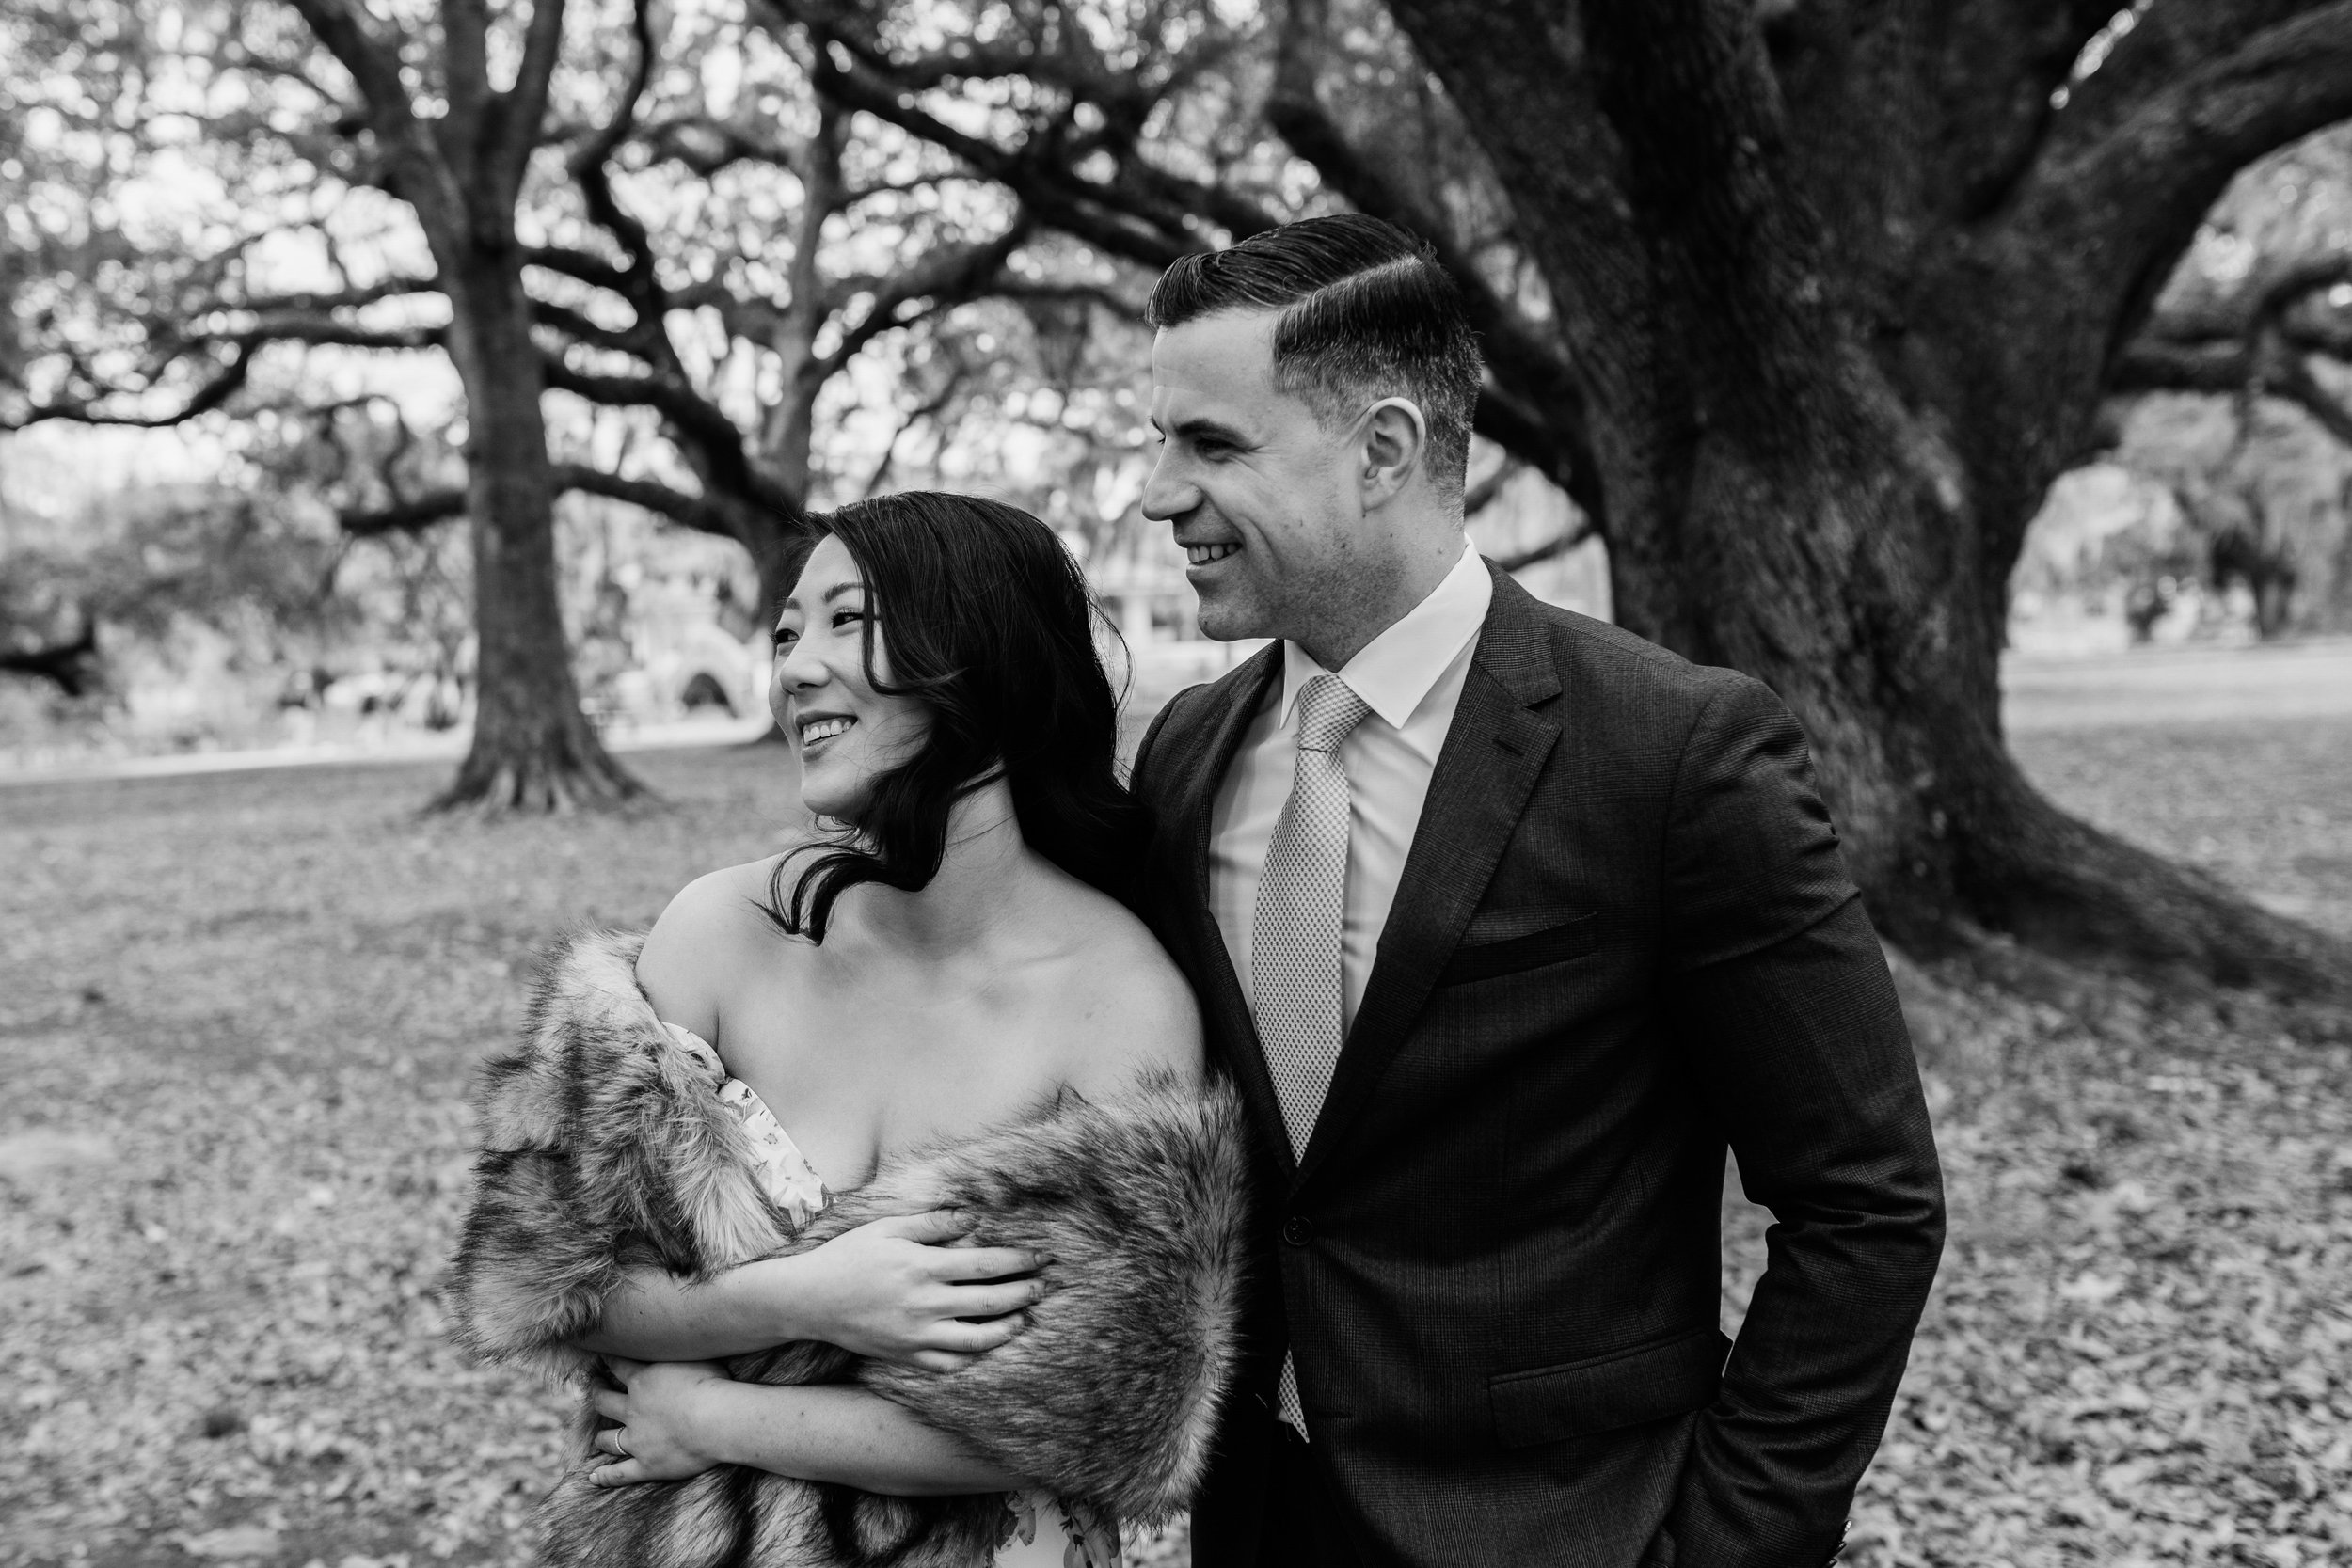 City Park Elopement New Orleans Wedding Photographer Ashley Biltz Photography13.jpg